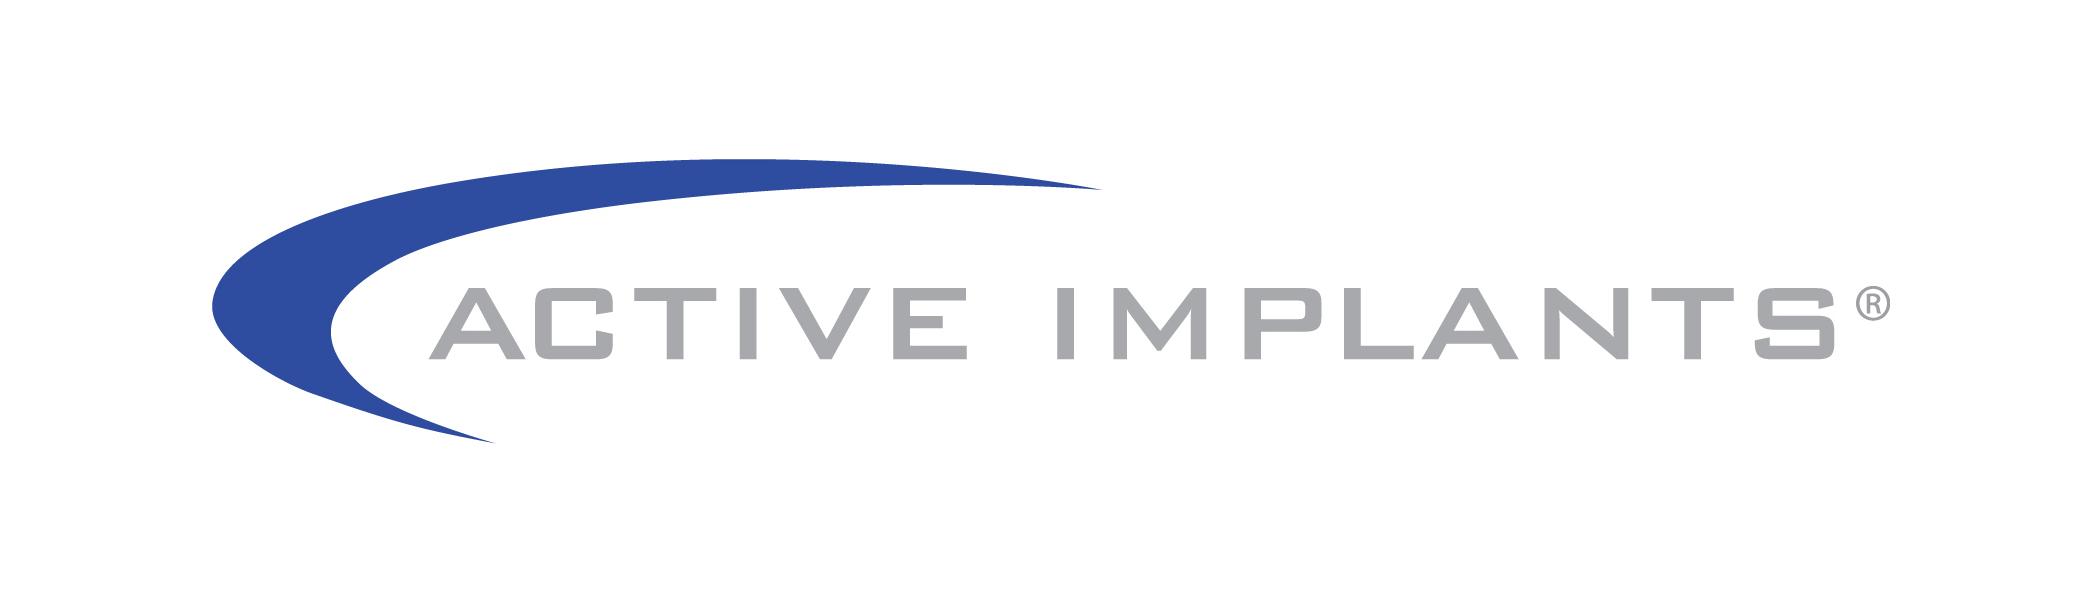 Active Implants company logo